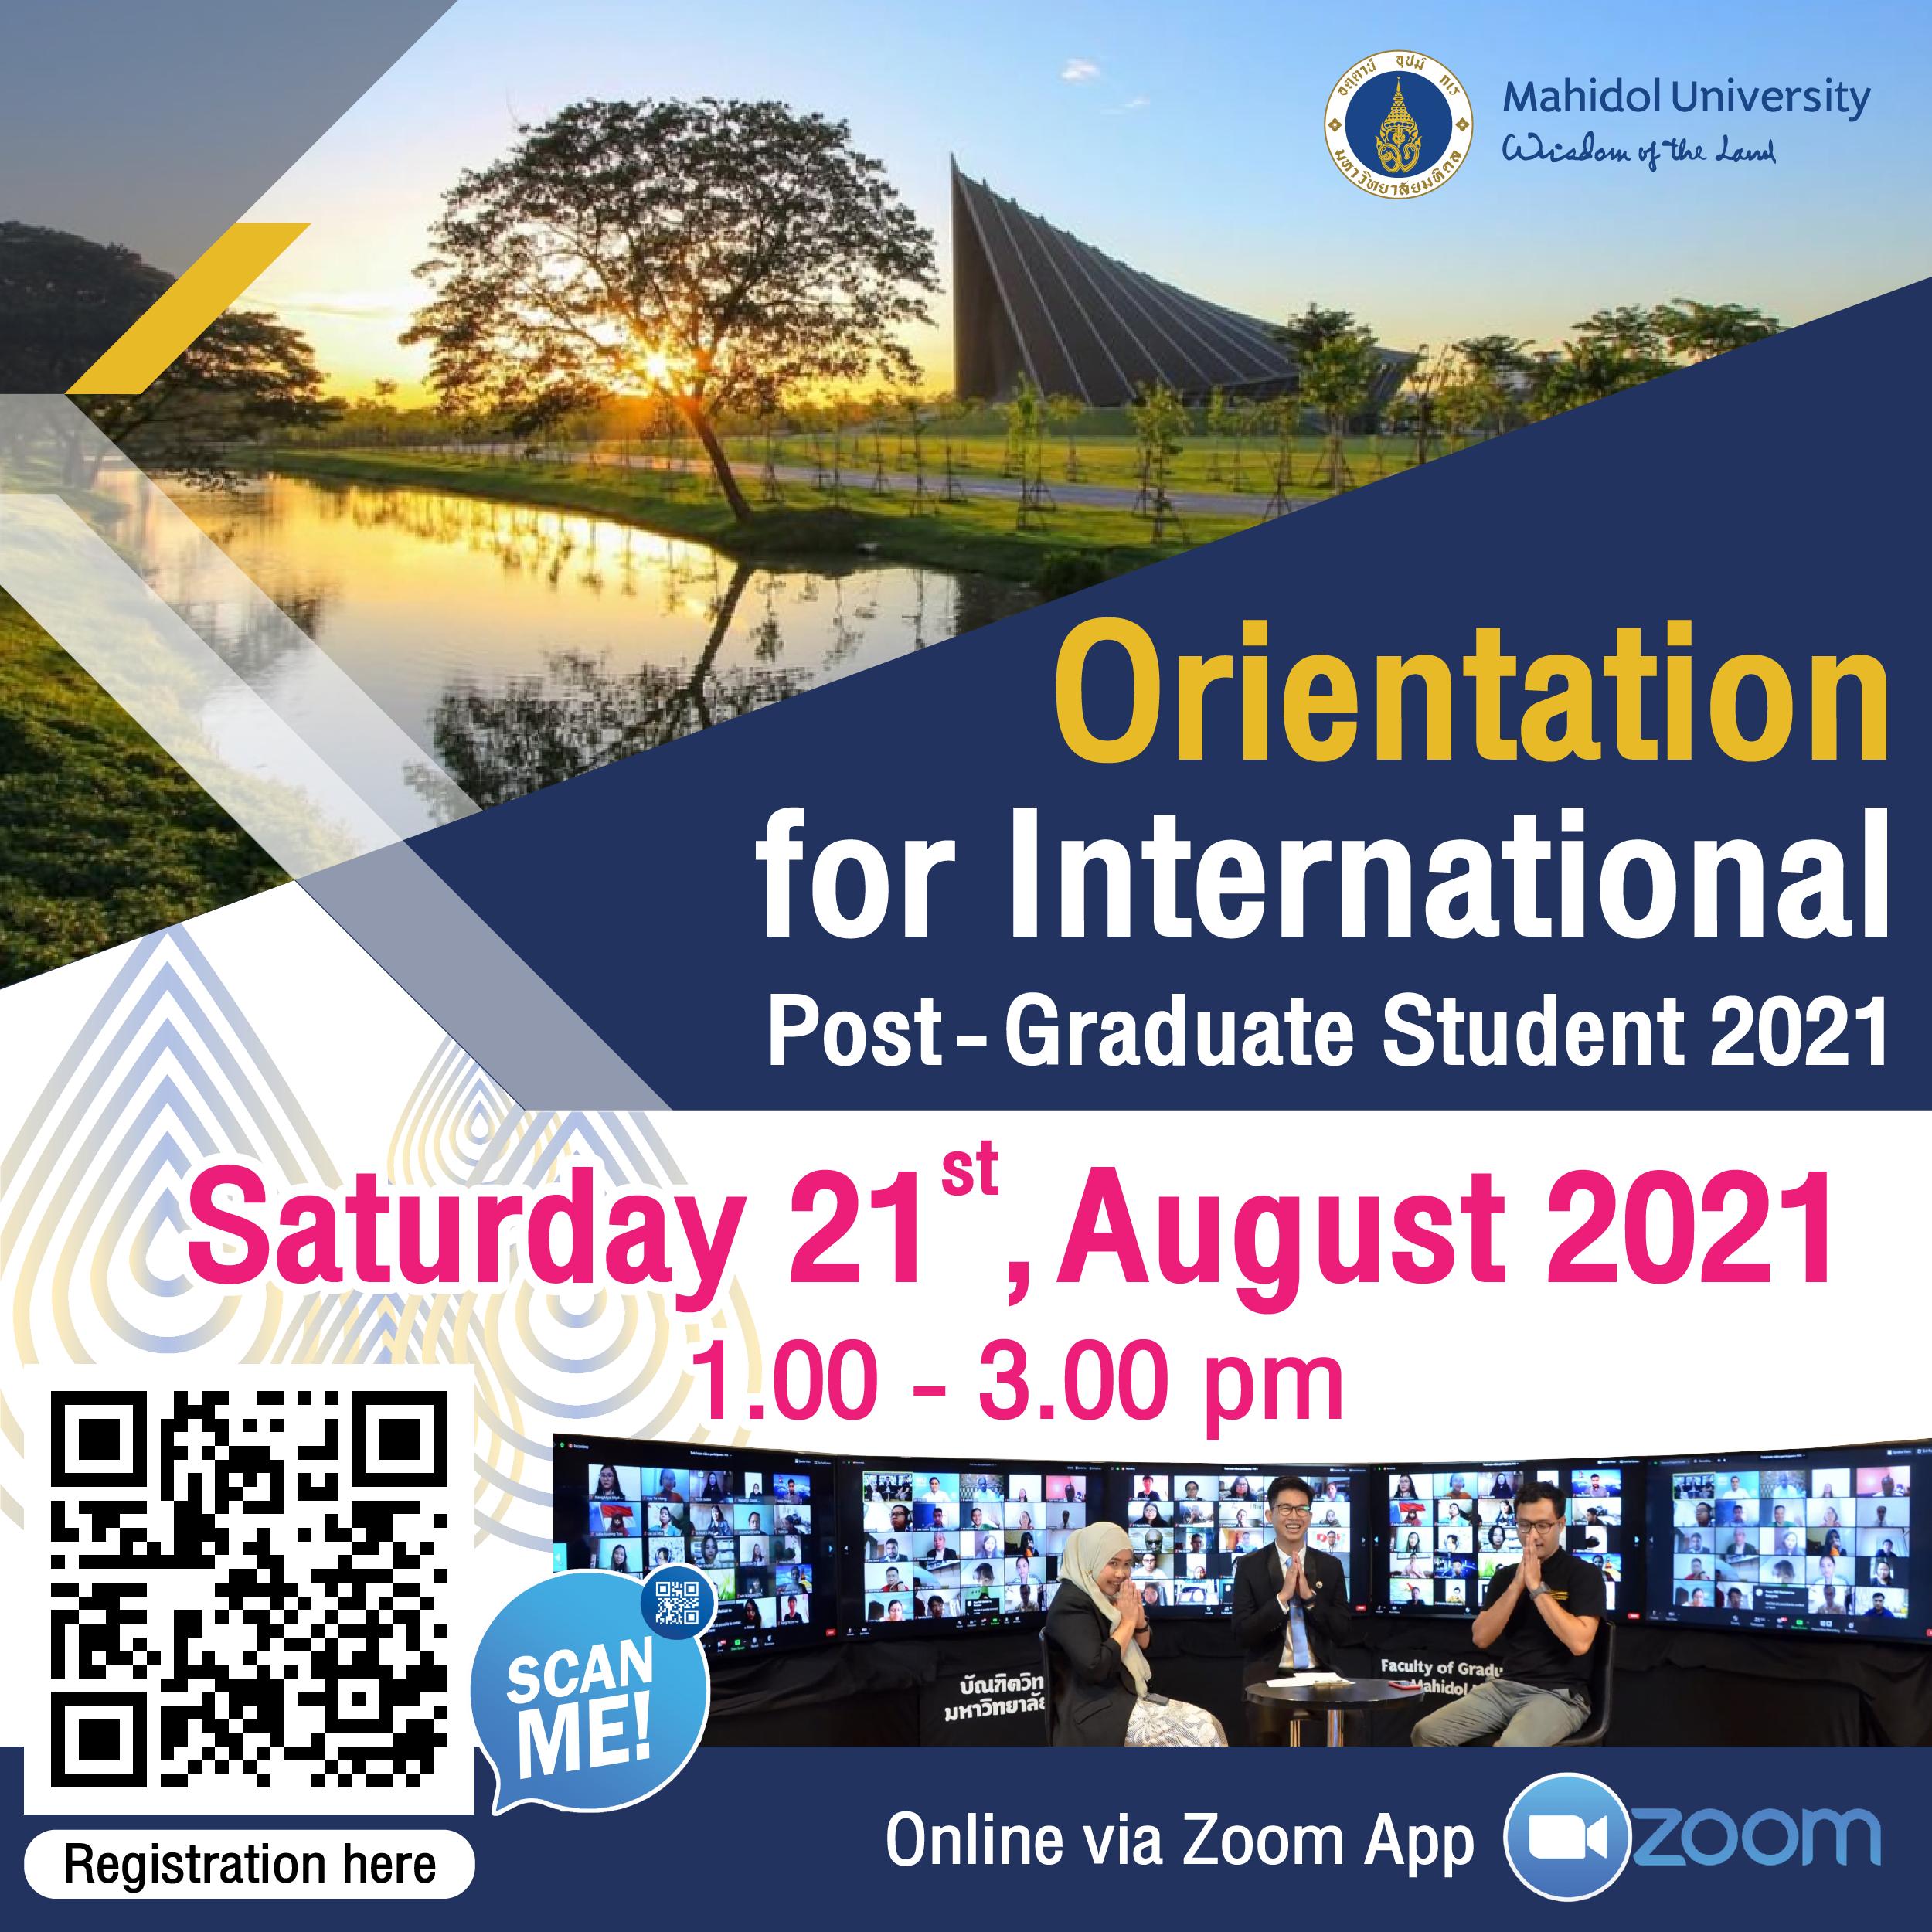 Orientation for International Post-Graduate Student 2021